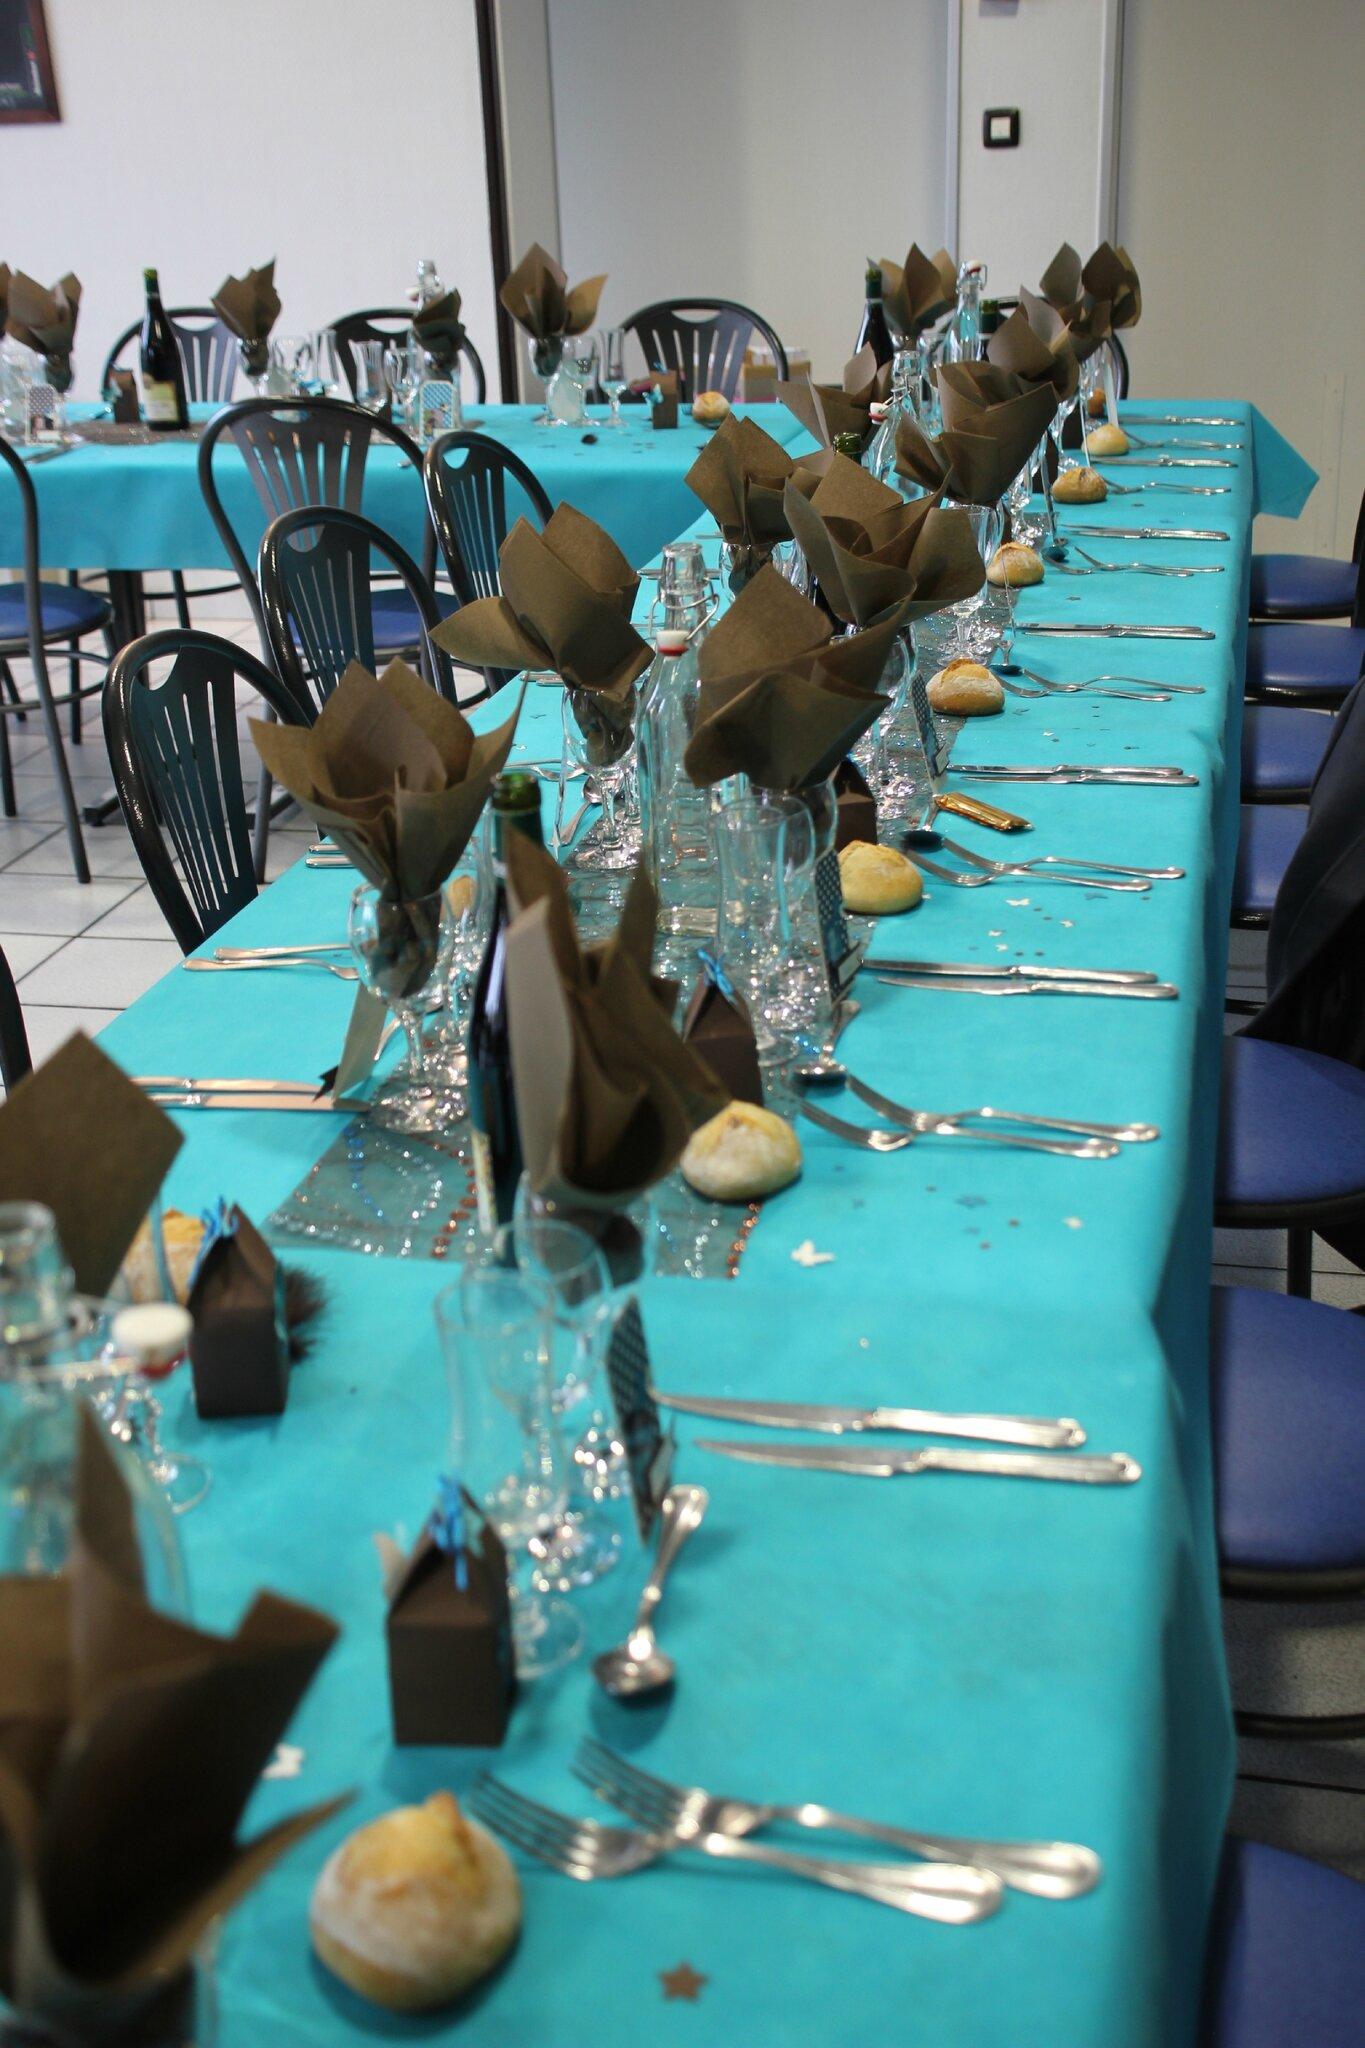 Un bapt me turquoise et chocolat toyote passions - Deco table turquoise chocolat ...